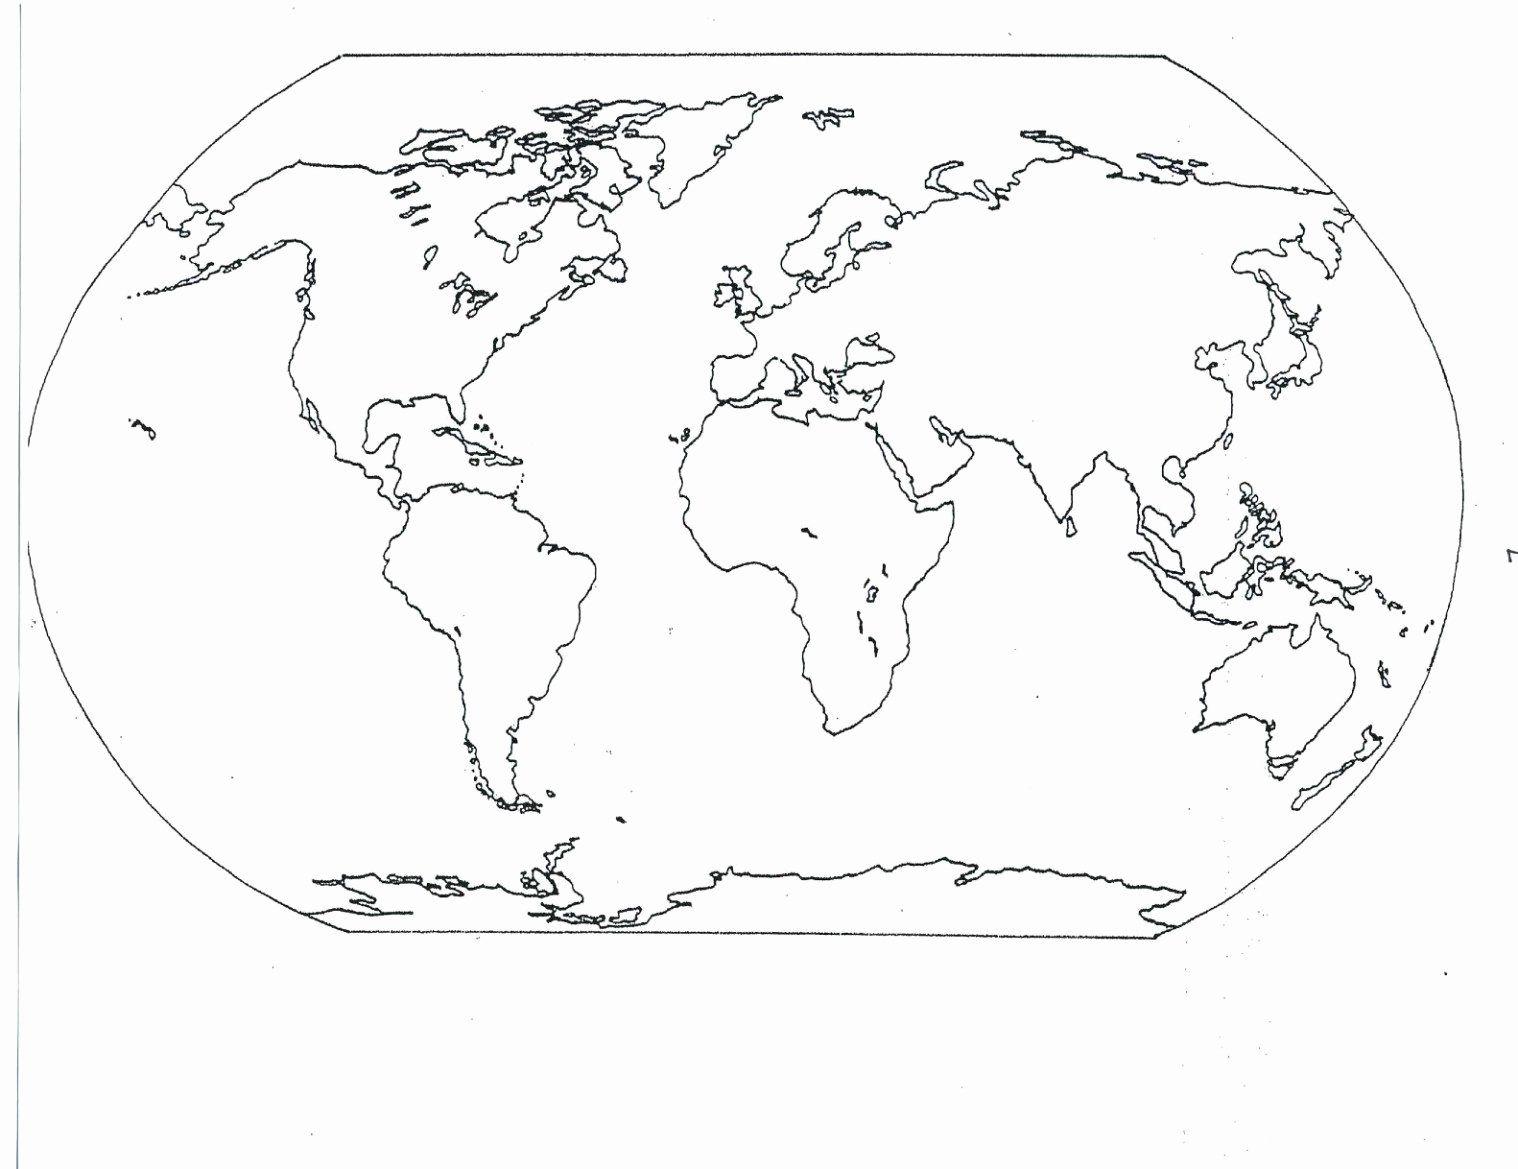 World Map Coloring Page Pdf Elegant Unlabeled Map Europe Climatejourney Geografi